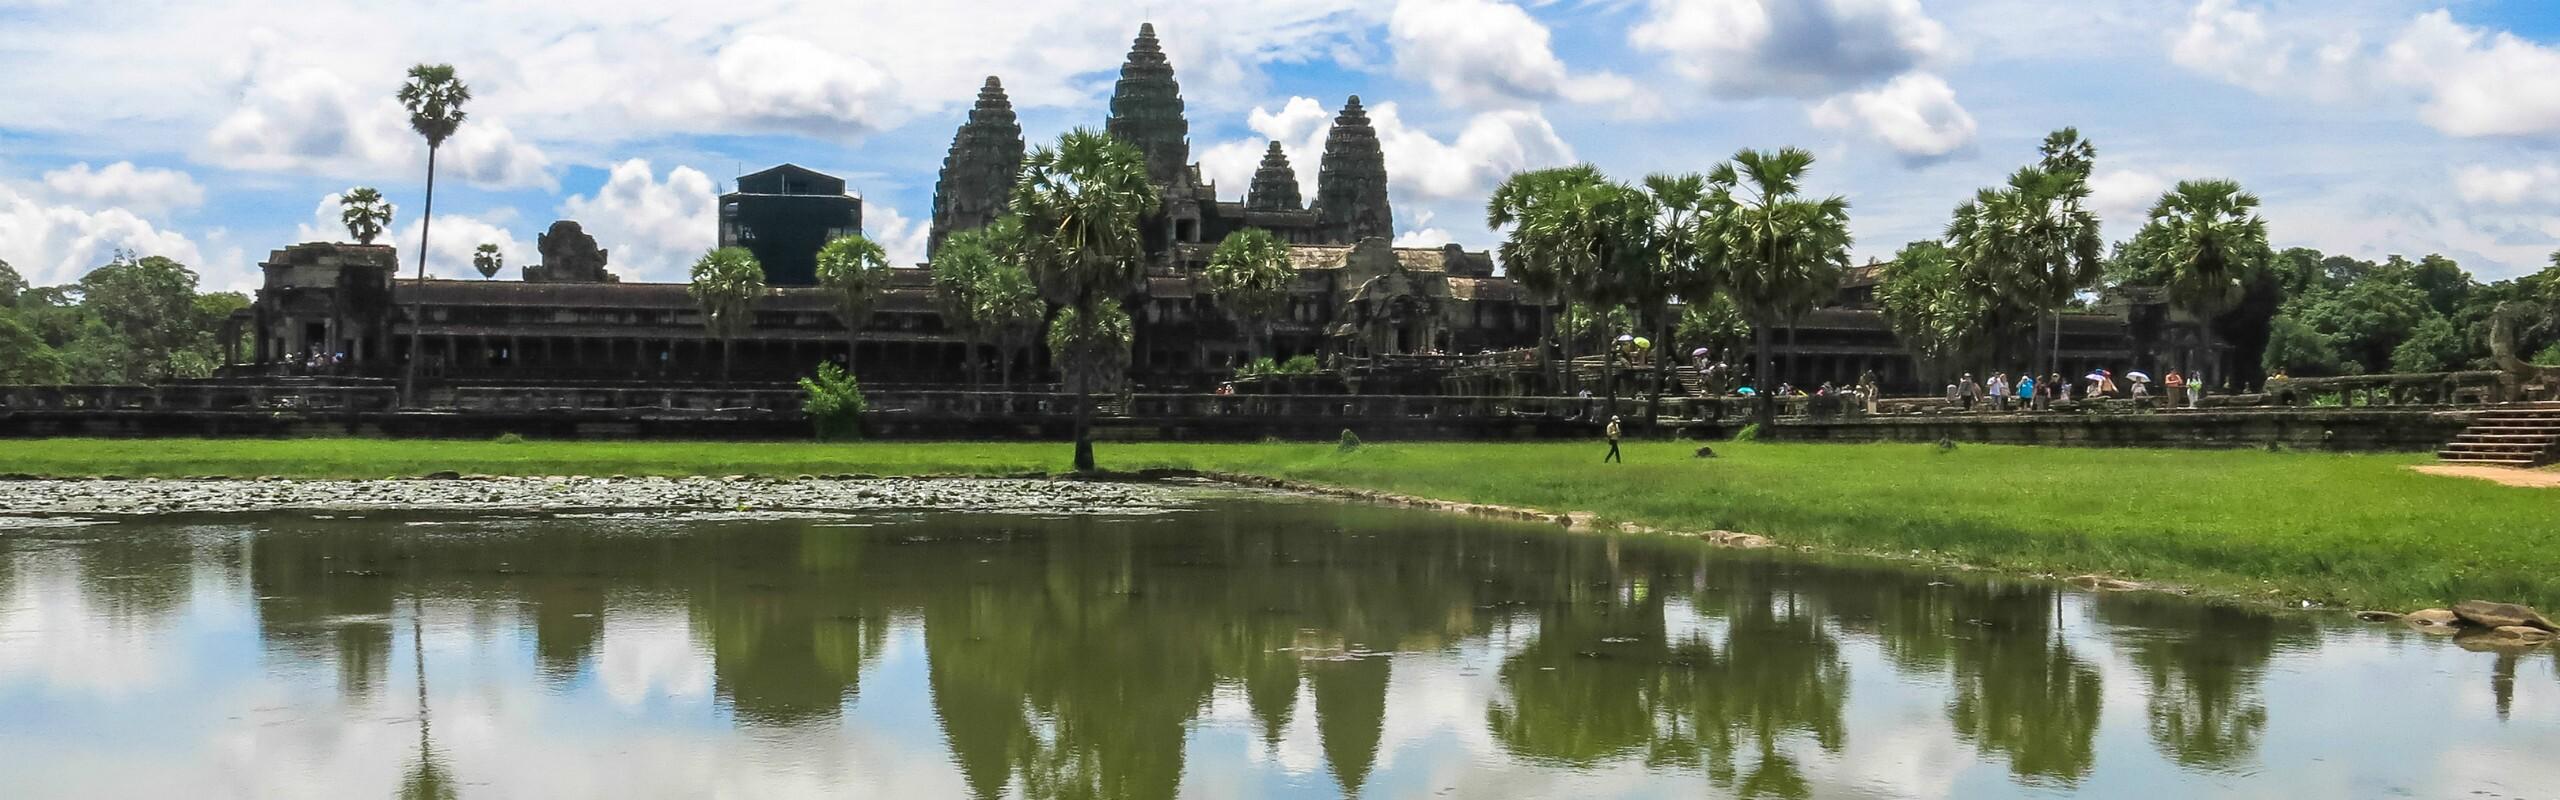 Why Angkor Wat Was Built, How's Angkor Wat Discovered